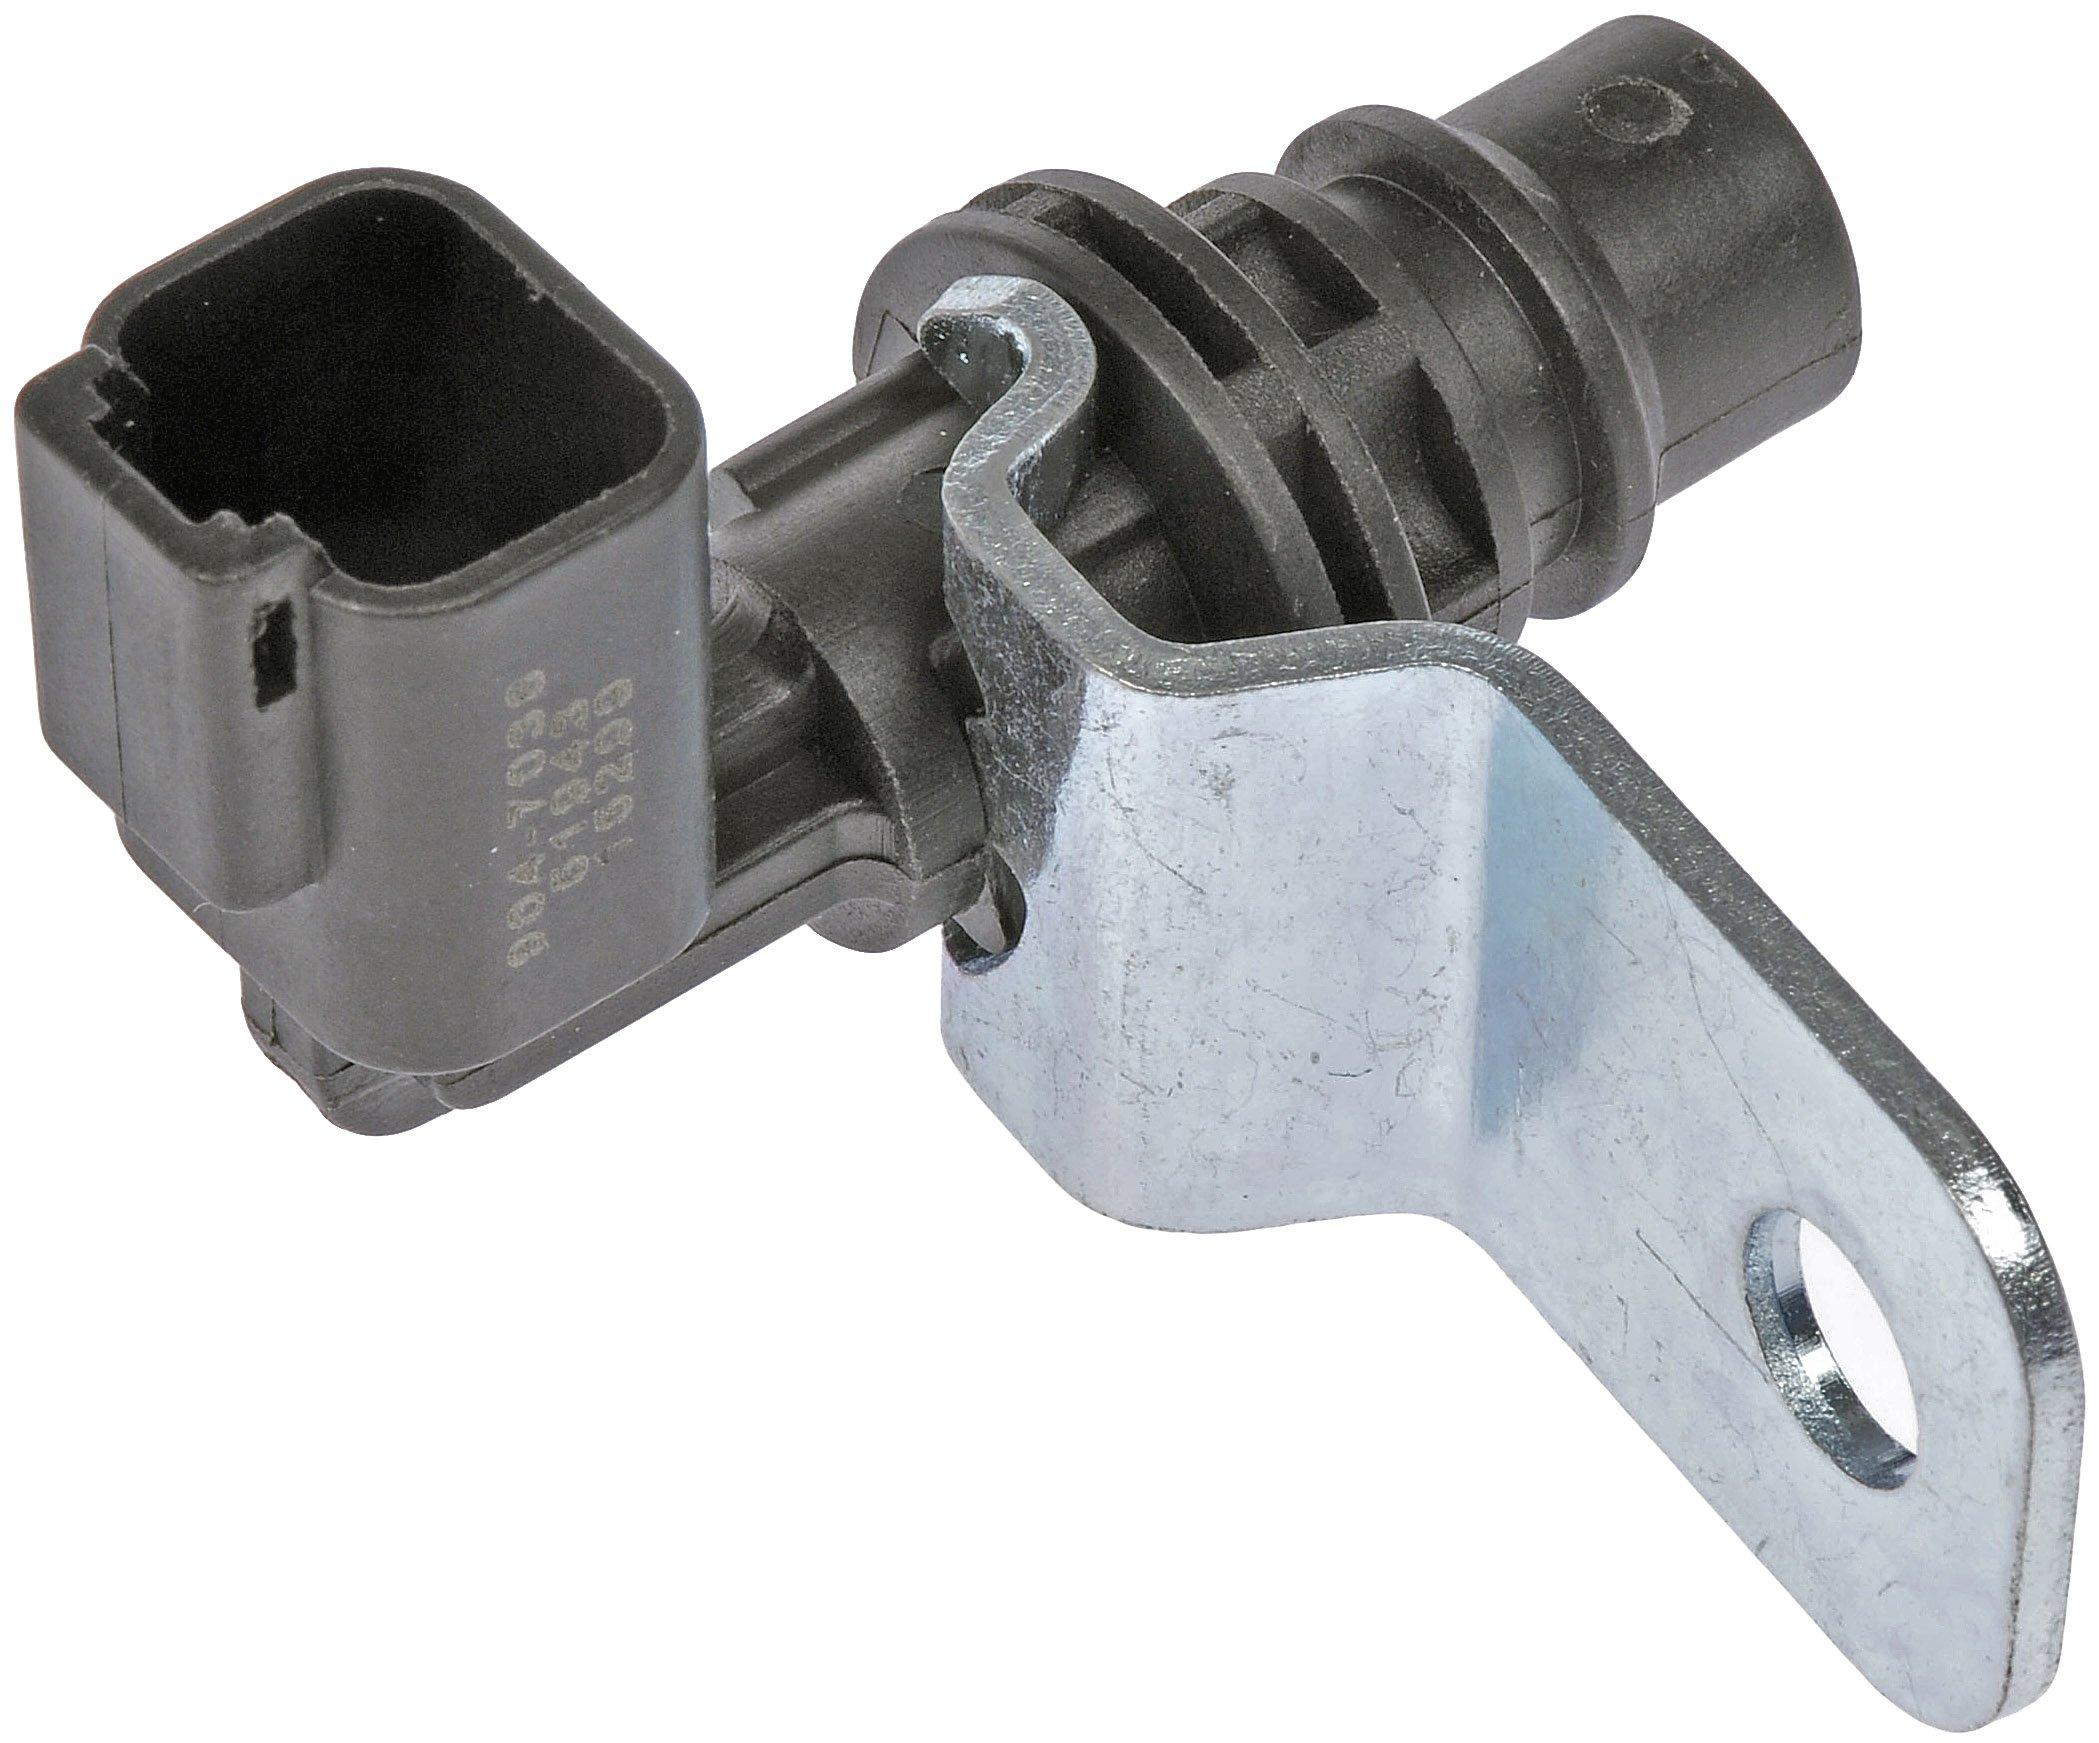 Dorman 904-7038 Camshaft Position Sensor